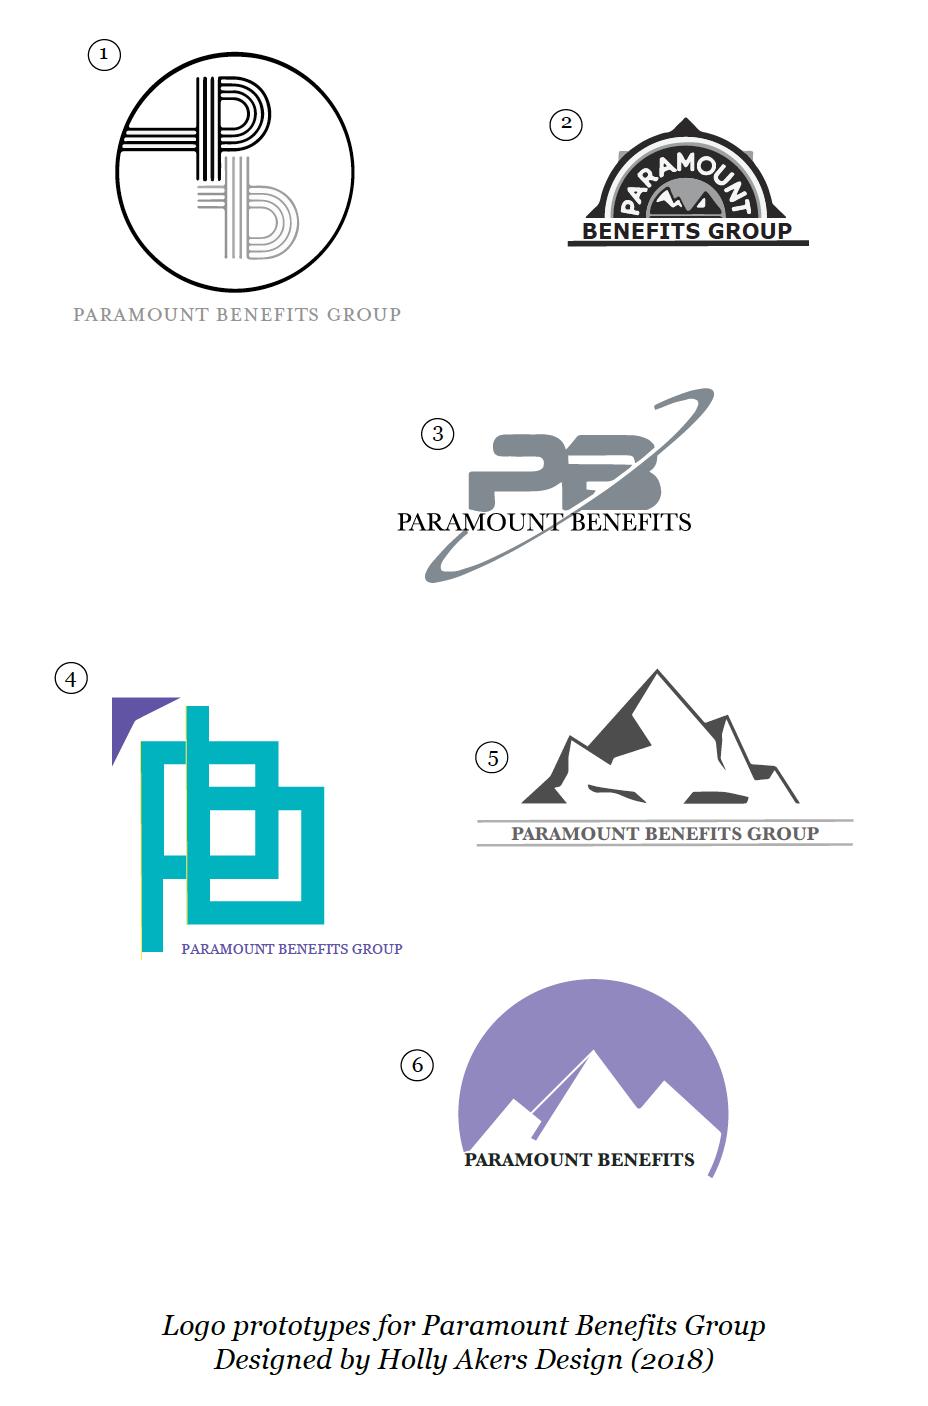 Paramount Benefits logo prototypes